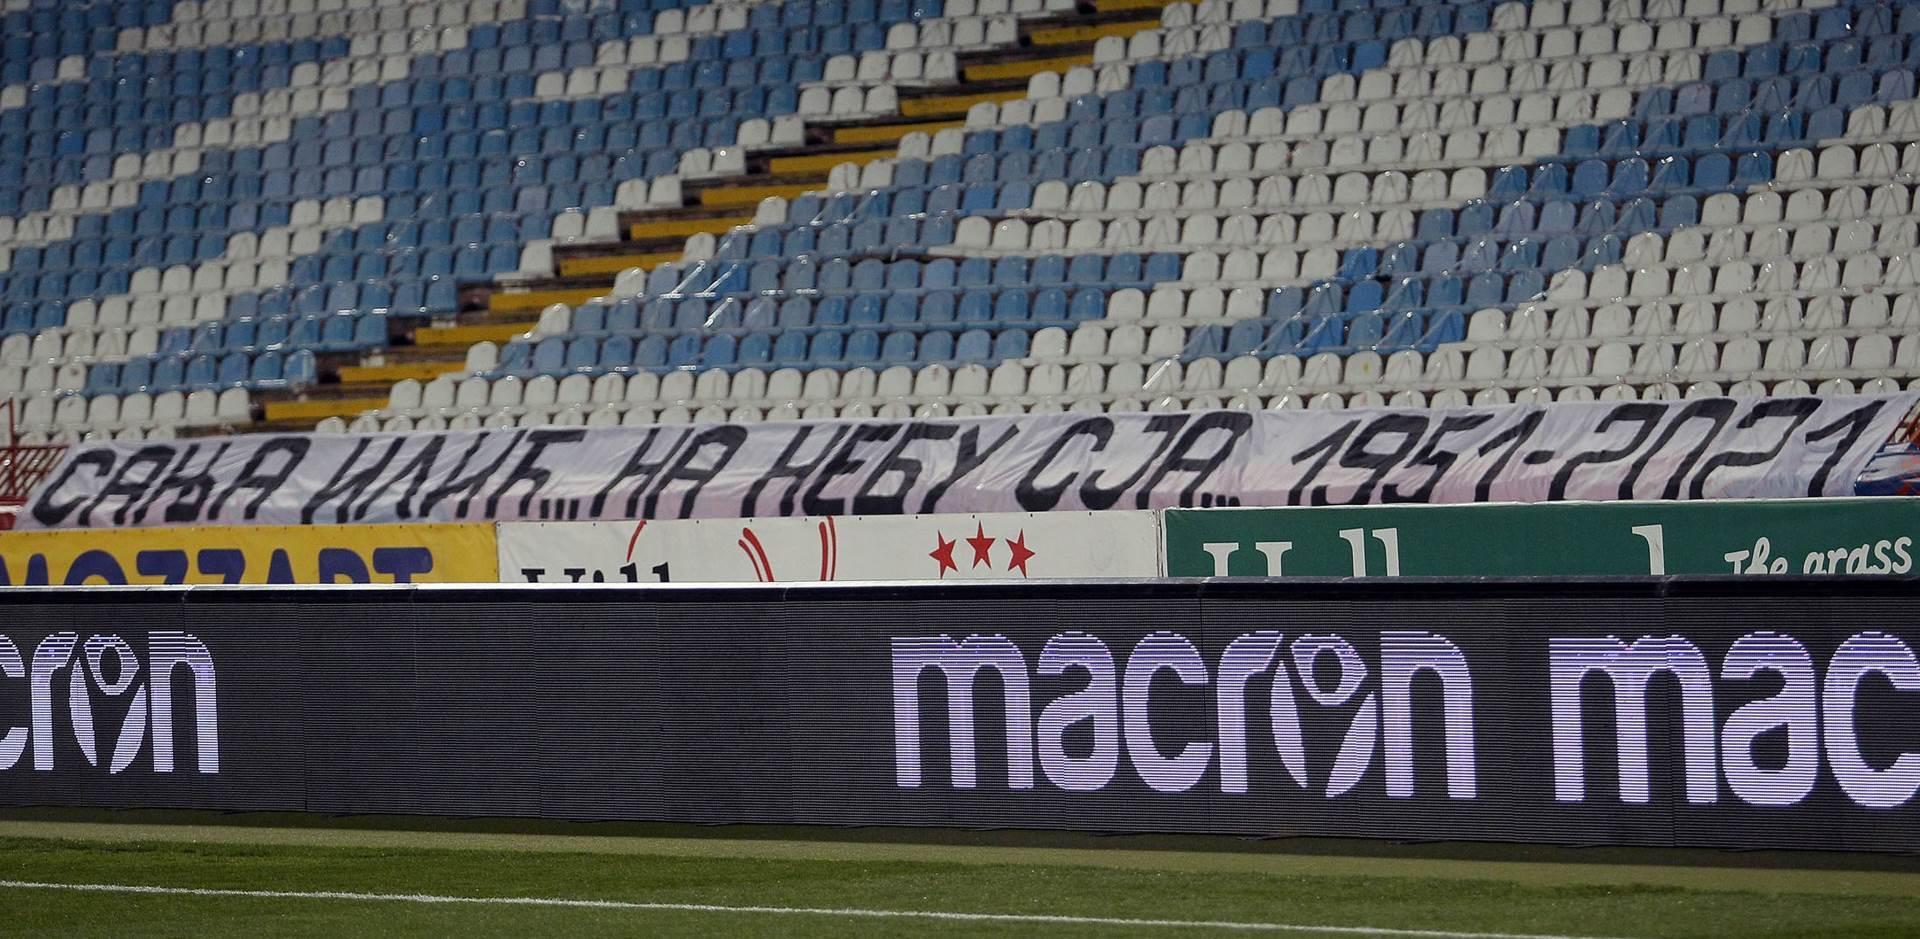 07, mart, 2021, Beograd - Utakmica 26. kola Linglong Super lige Srbije izmedju FK Crvena zvezda i FK Cukaricki odigrana je na stadionu Rajko Mitic. Photo: Bane T. Stojanovic/ATAImages